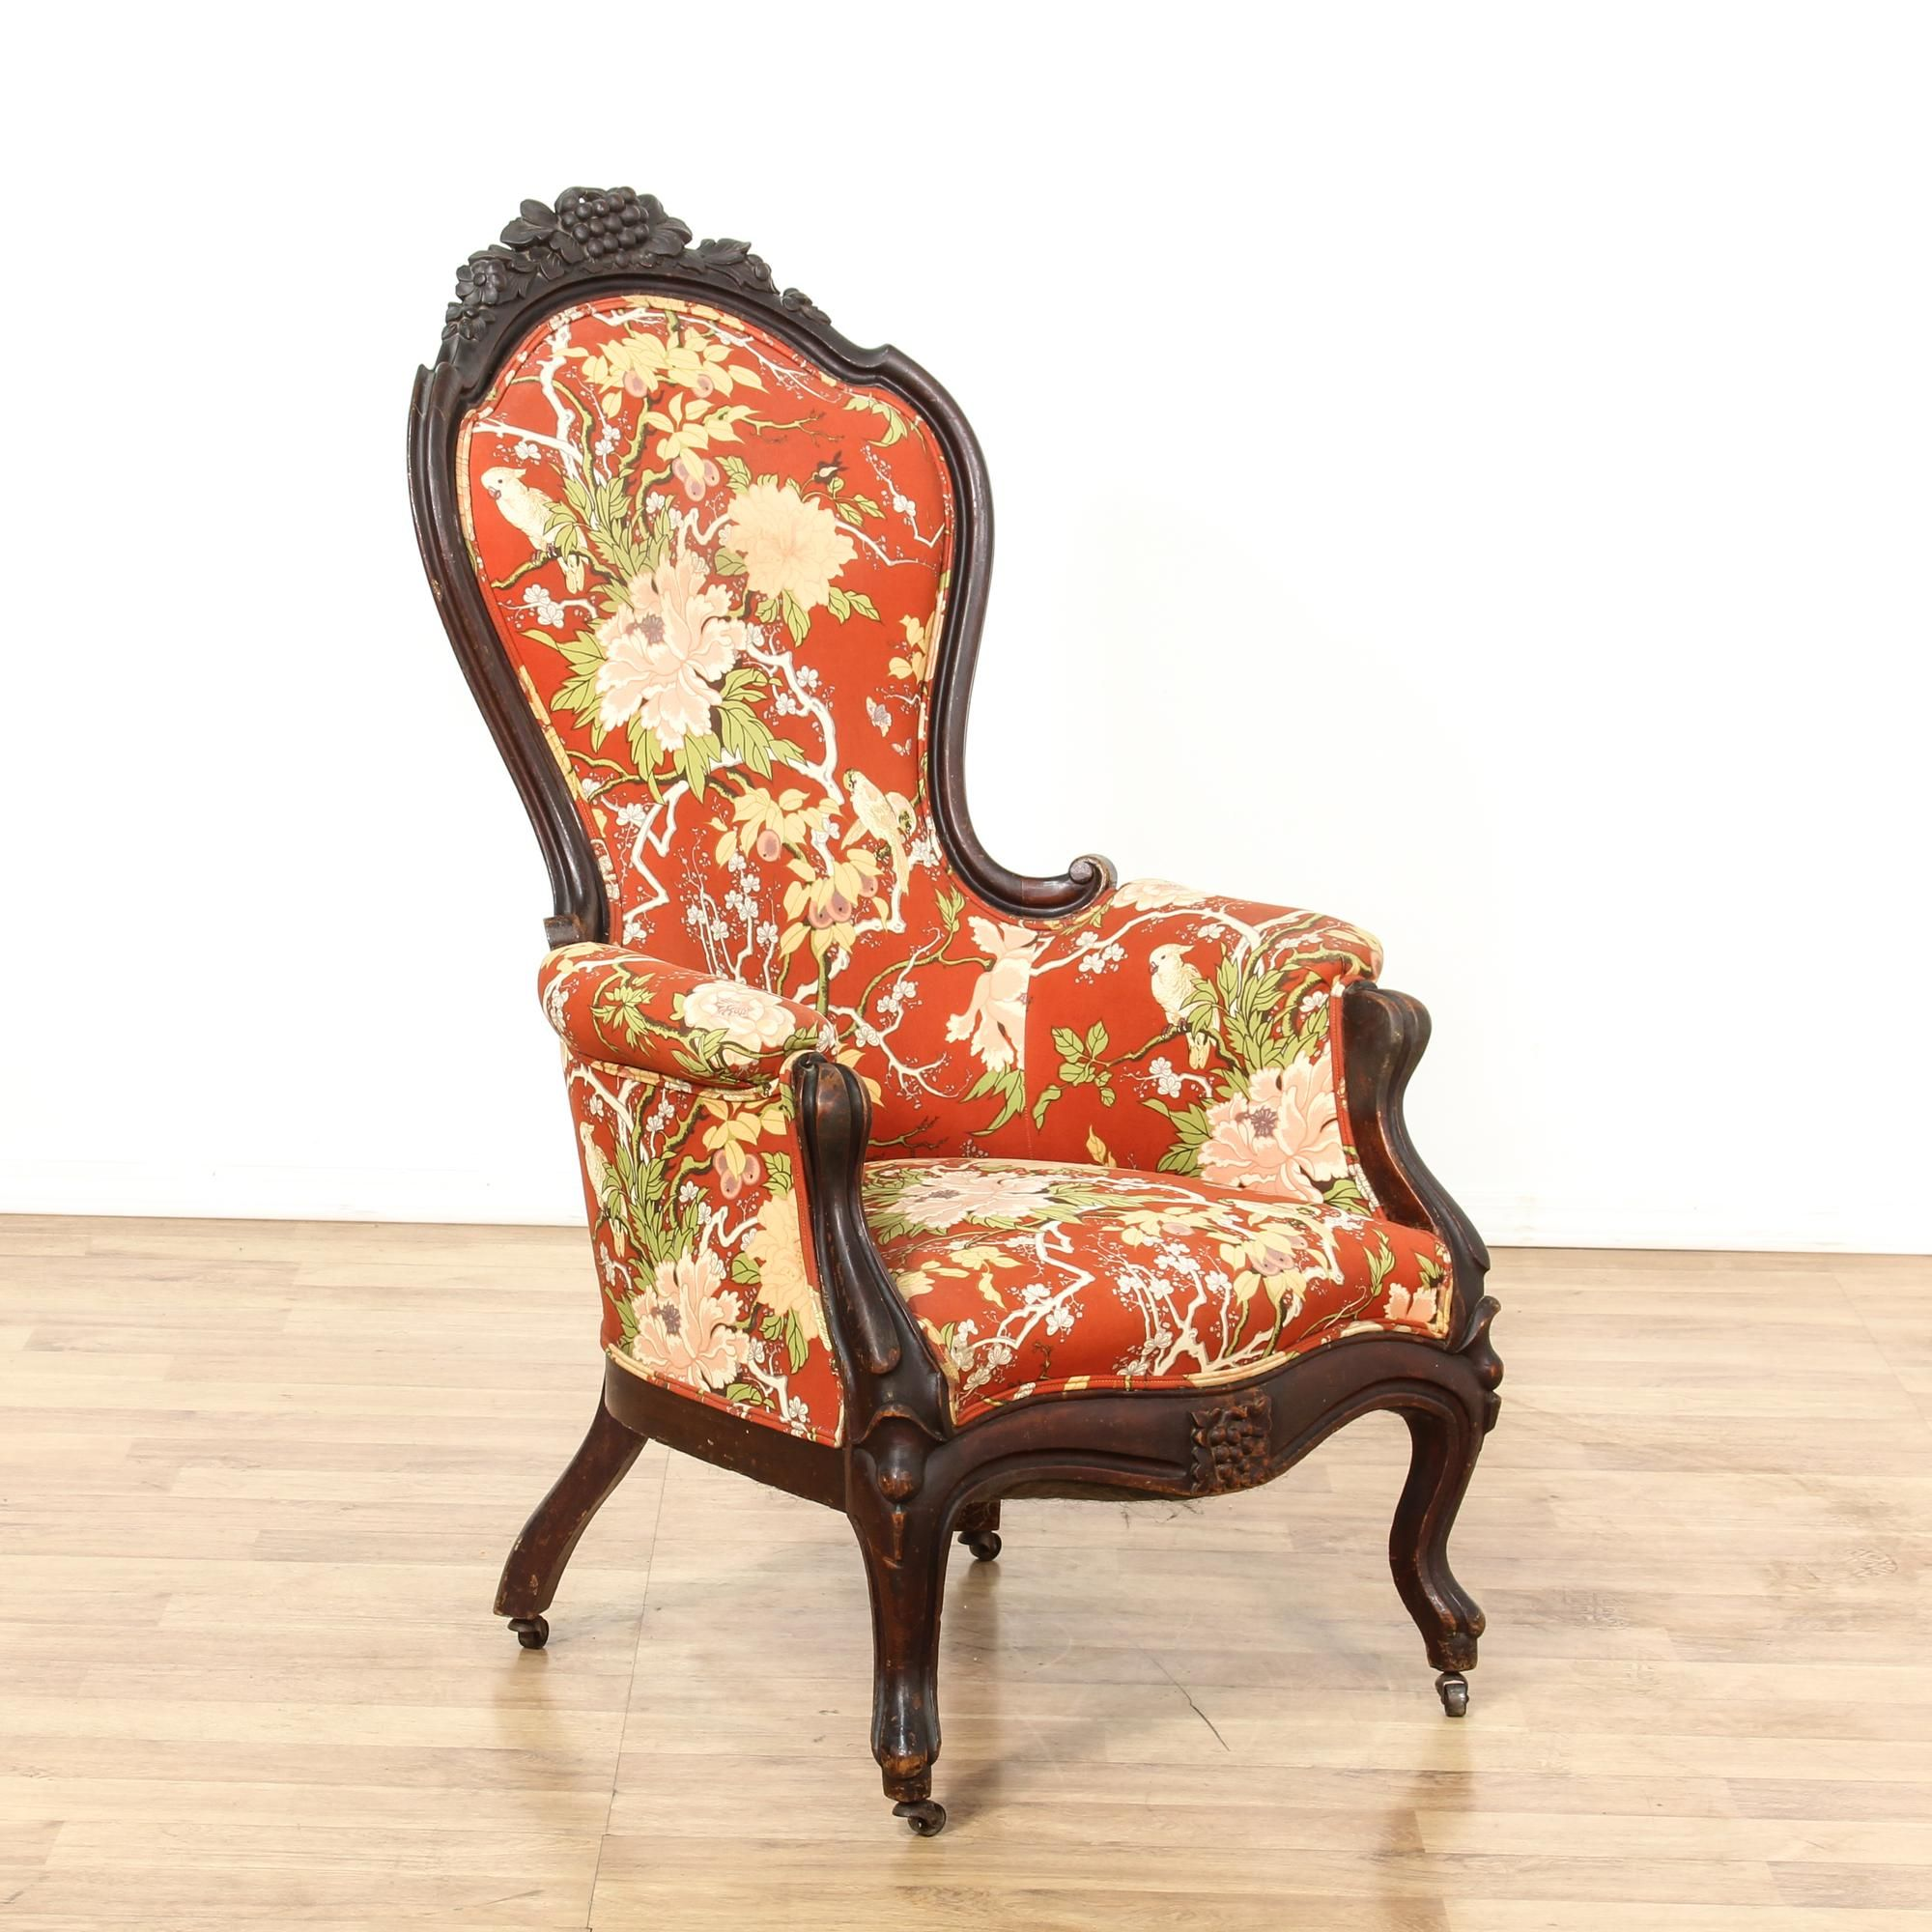 Charmant Red Floral Upholstered Carved Victorian Side Chair | Loveseat Vintage  Furniture San Diego U0026 Los Angeles